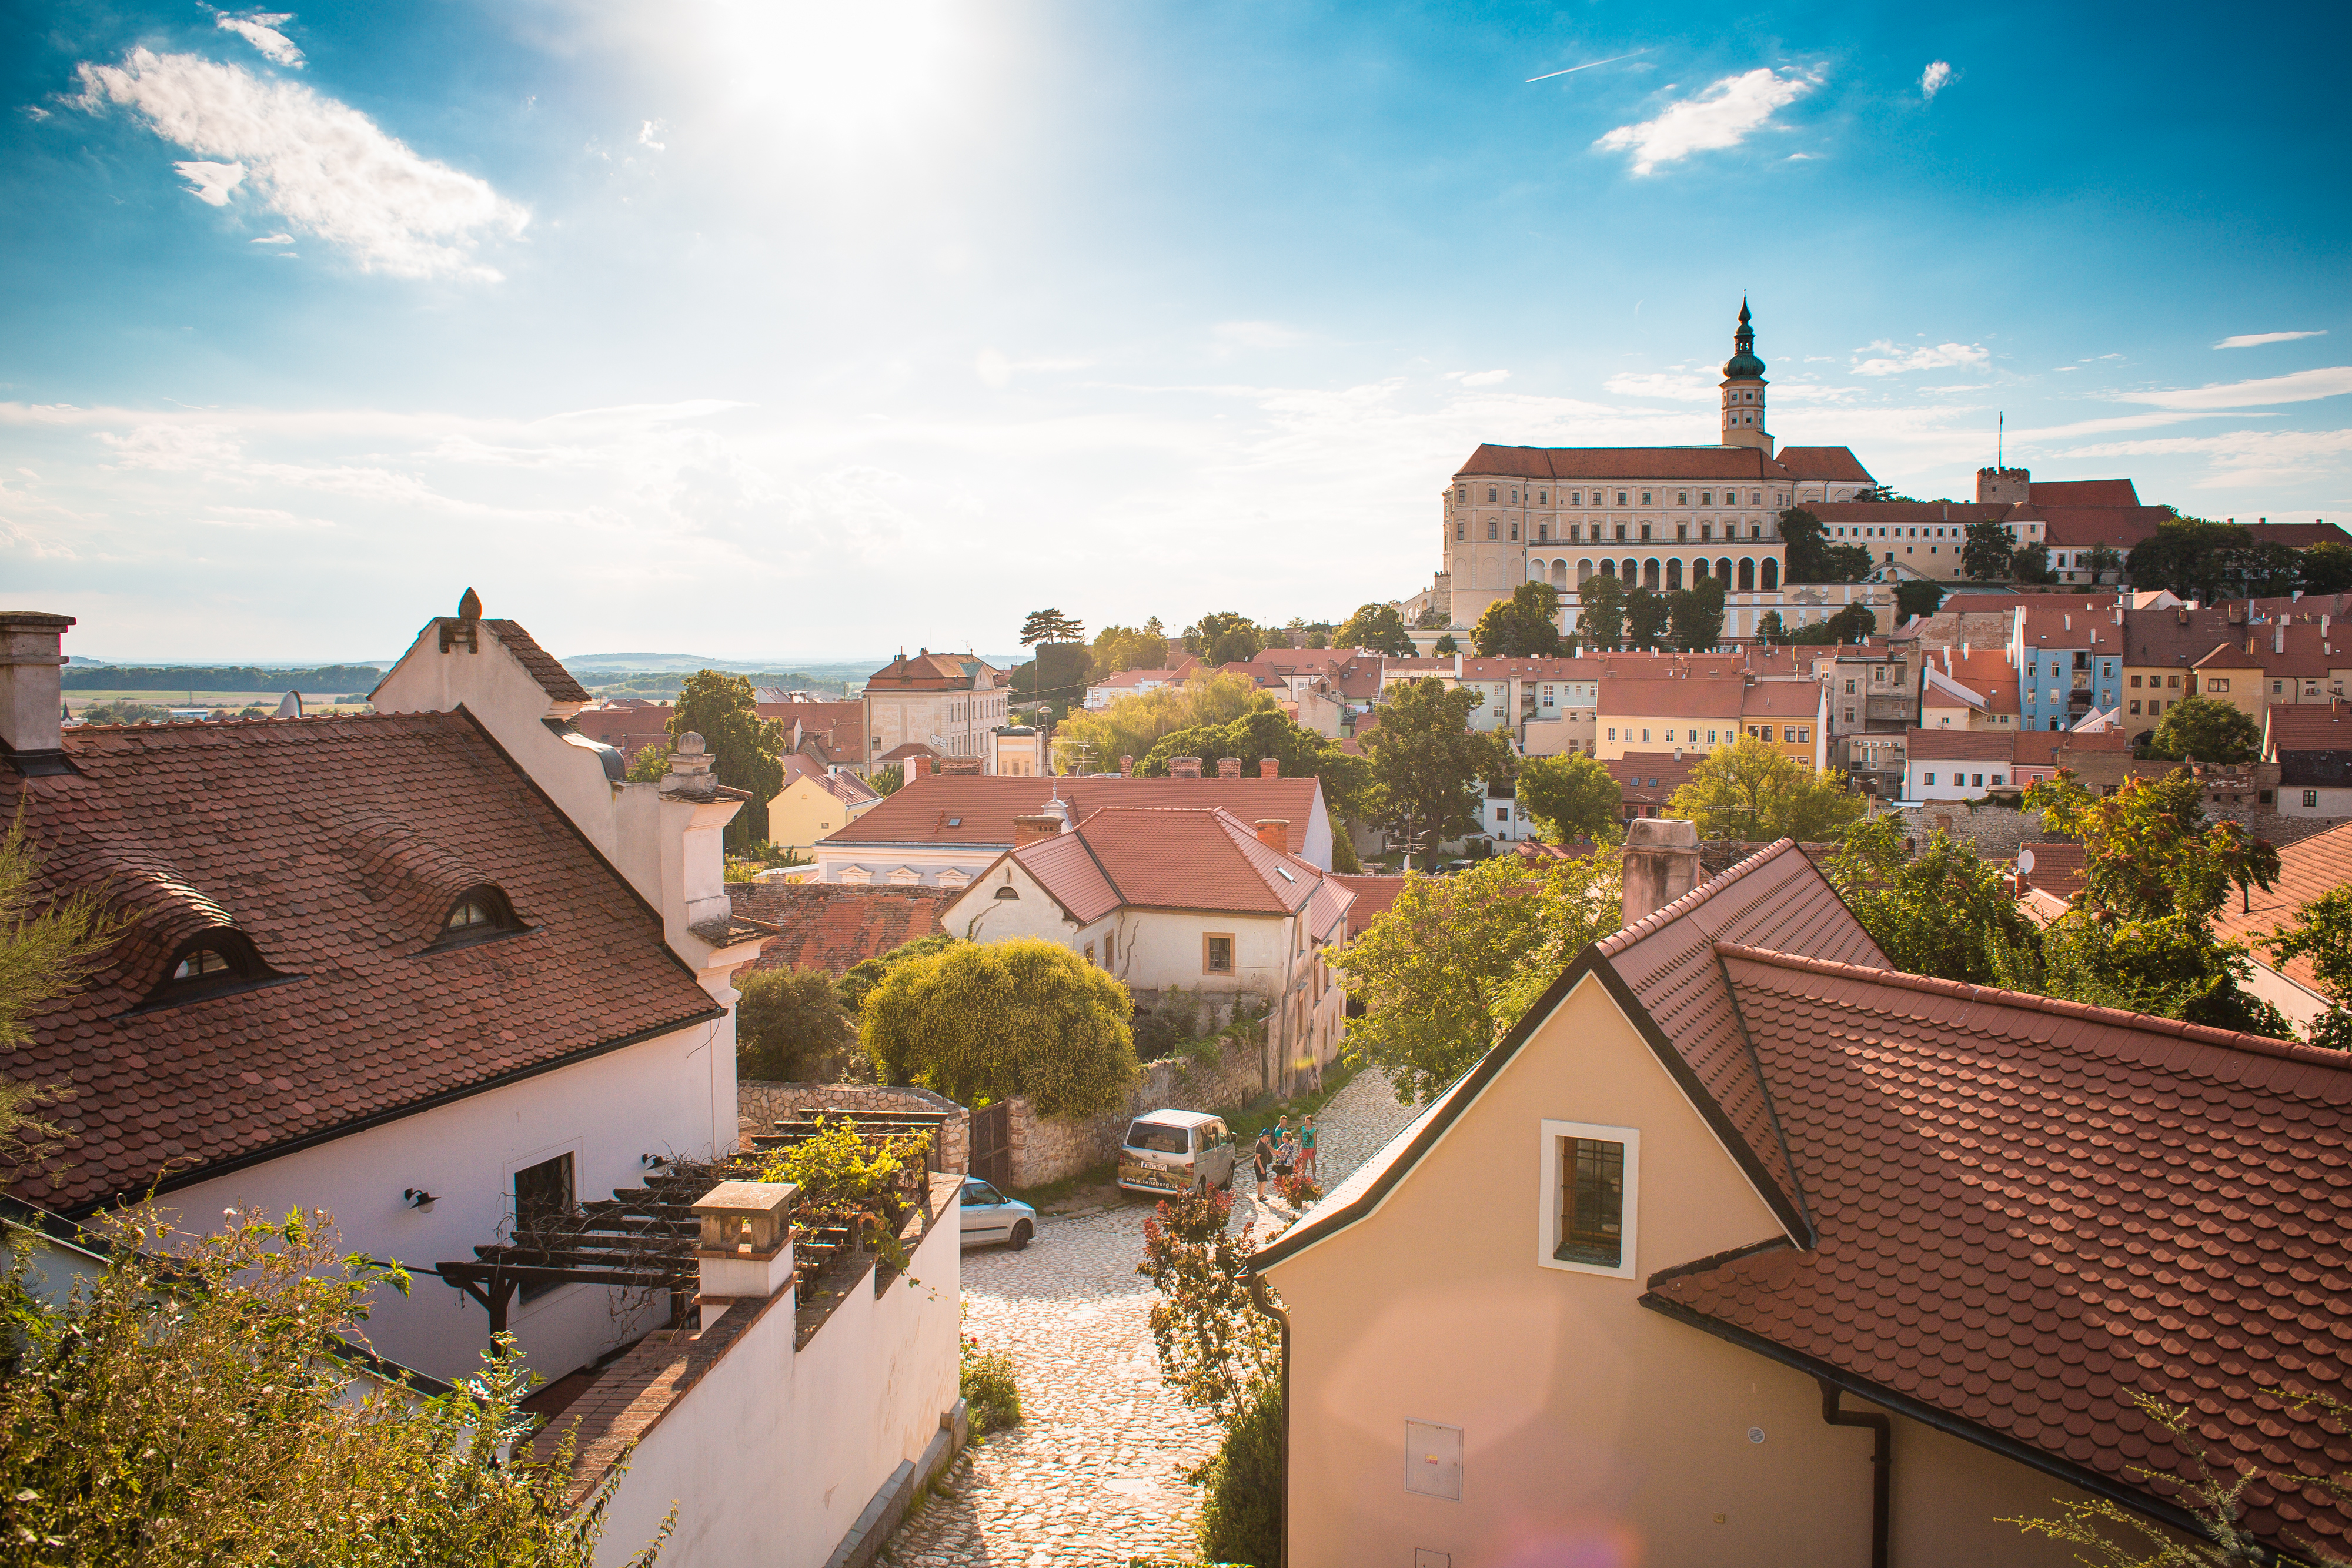 Http Rumahcom Berita Properti 2016 9 136102 Tips Cari Rumah 1006 Karpet Cantik Wonderful City Of Mikulov Czech Republic Picjumbo Comoriginal